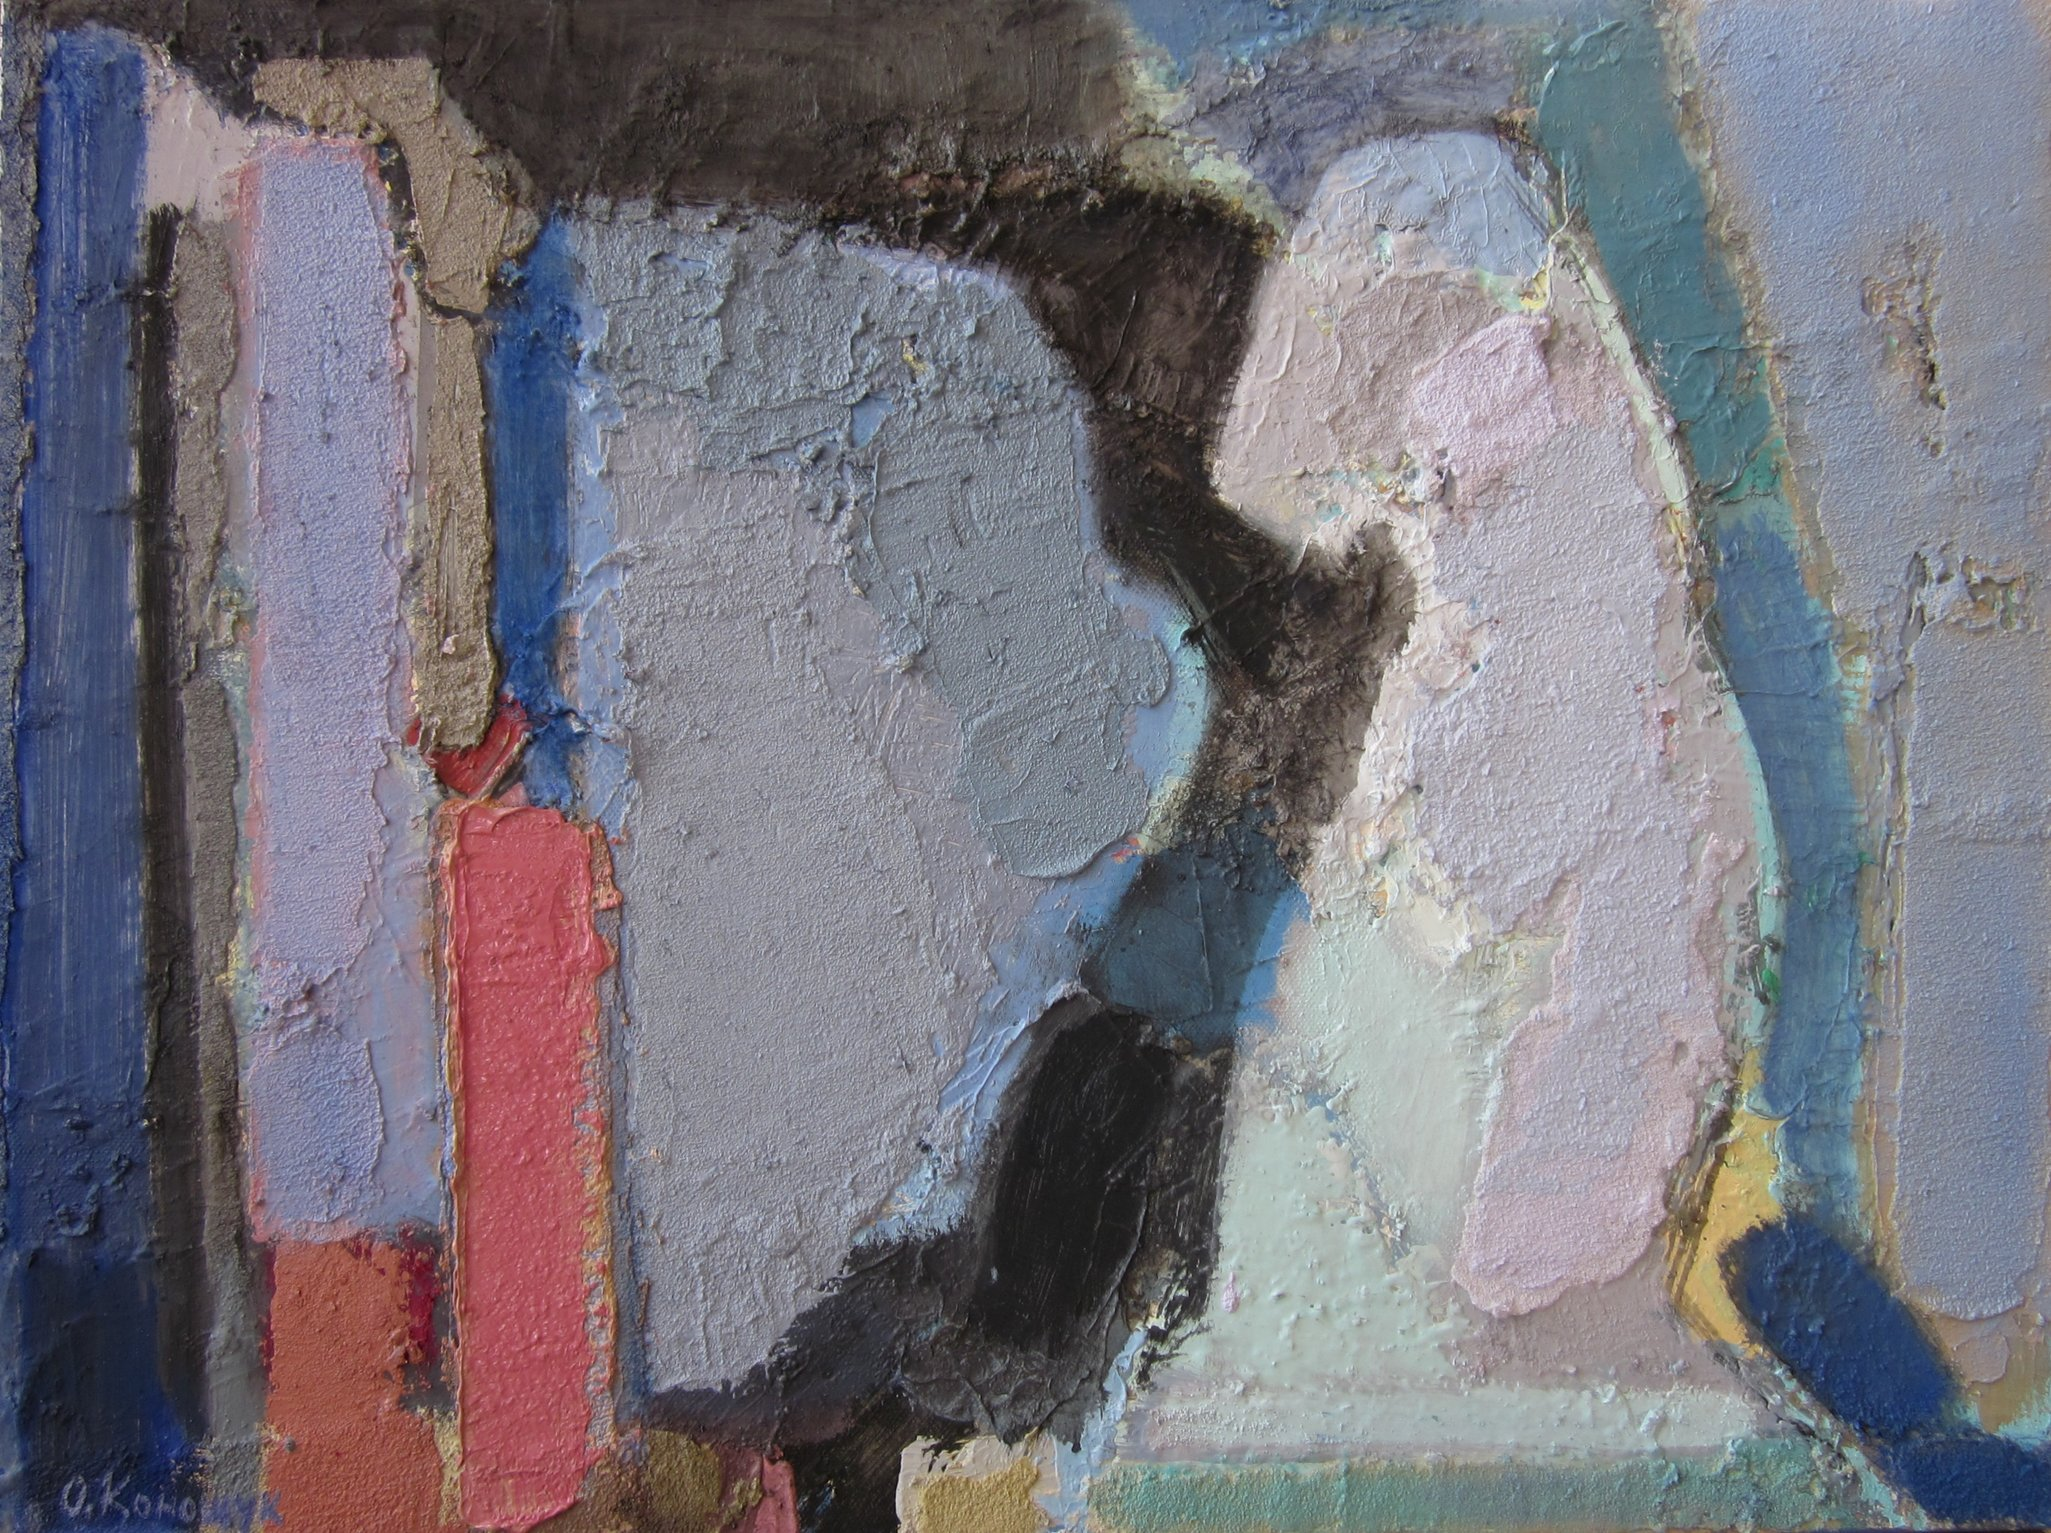 'Bookshelf with Venus' 2016 / 45x60cm / oil on canvas